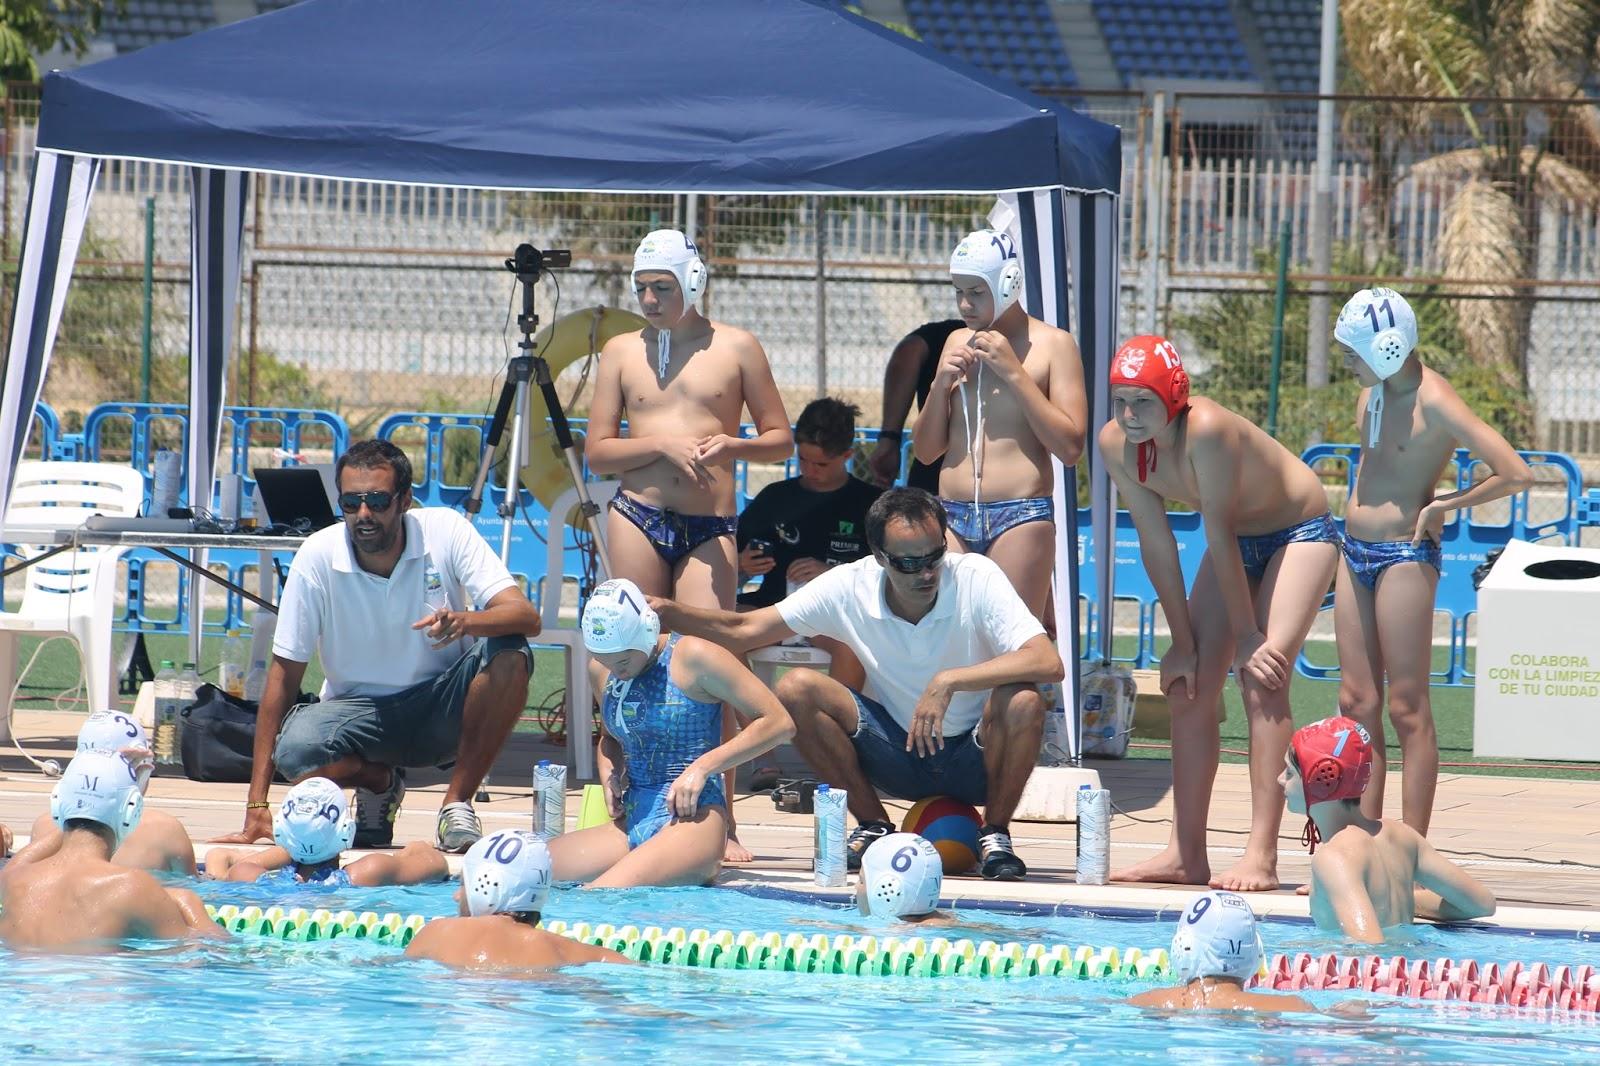 España grecia waterpolo resultado